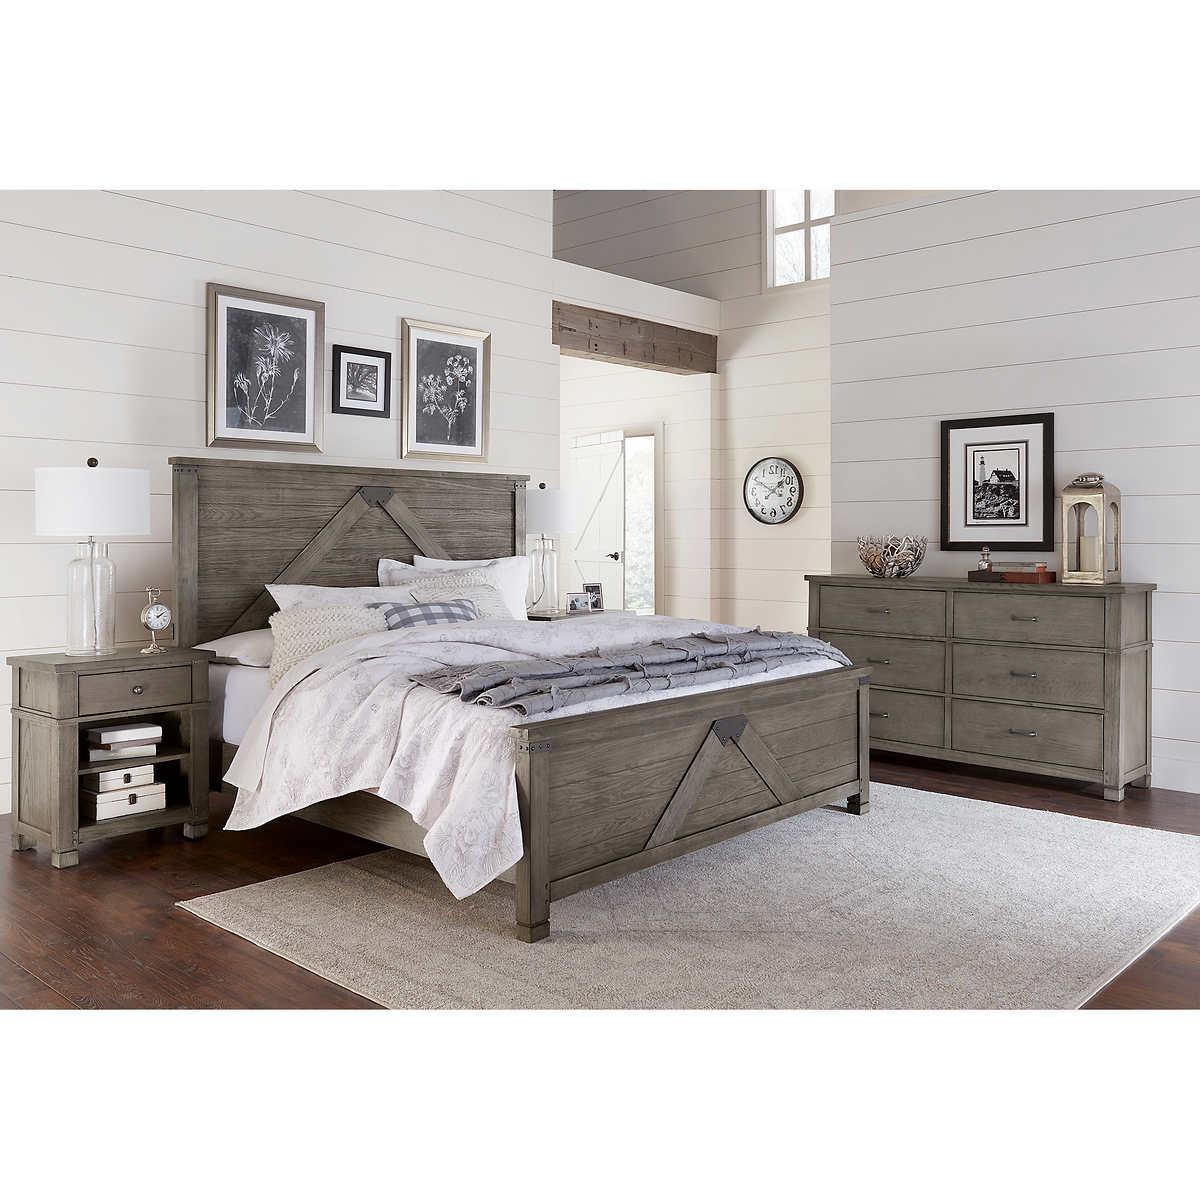 East Lake 4 Piece King Bedroom Set